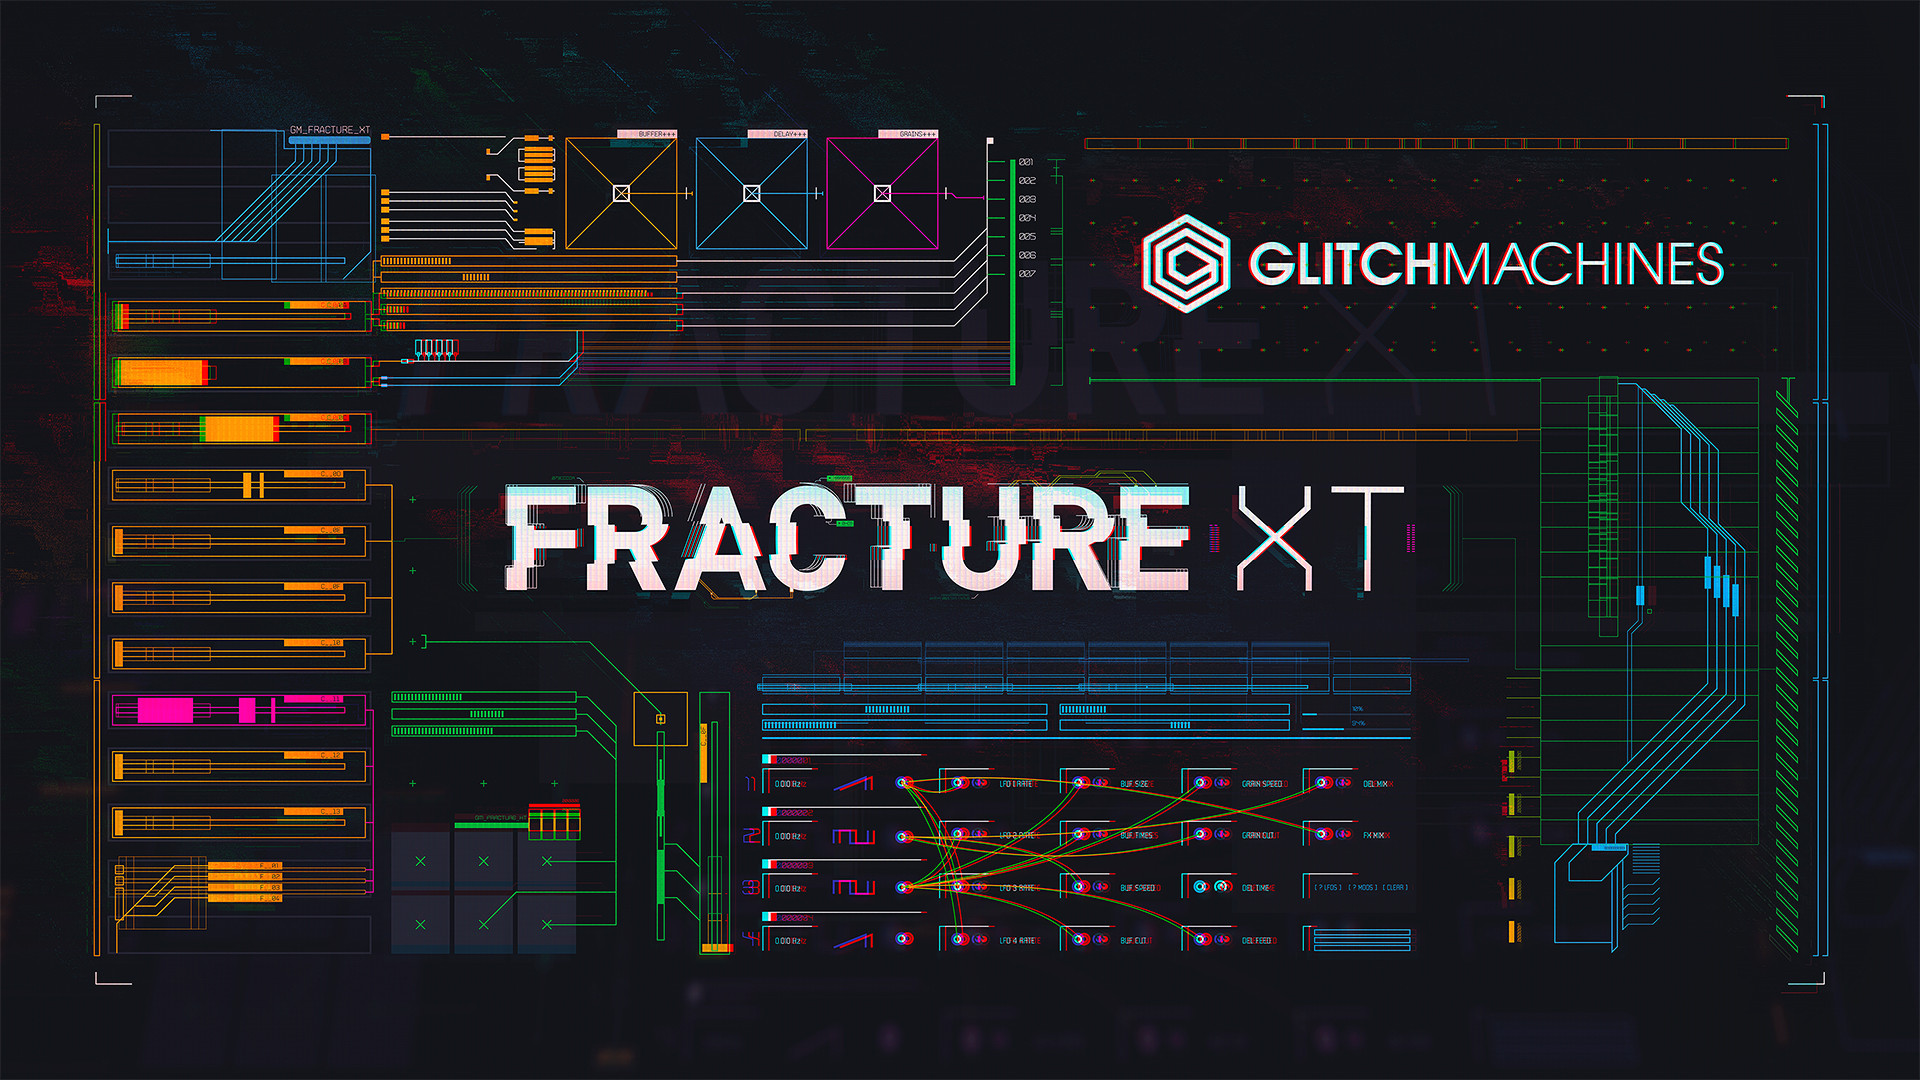 Glitchmachines - Fracture XT